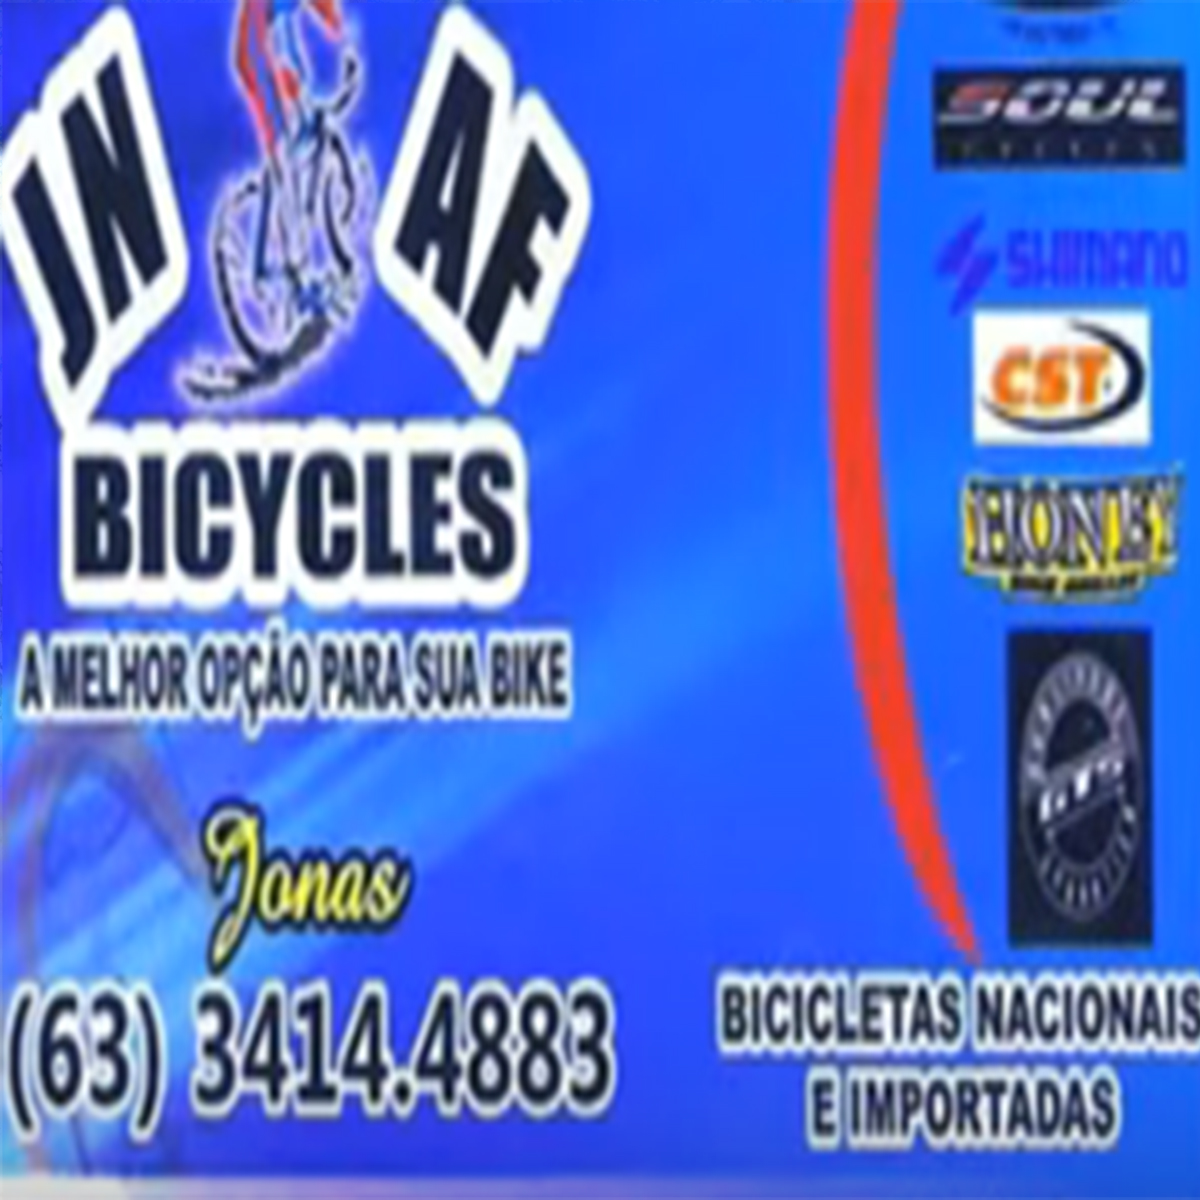 JNAF BICYCLES